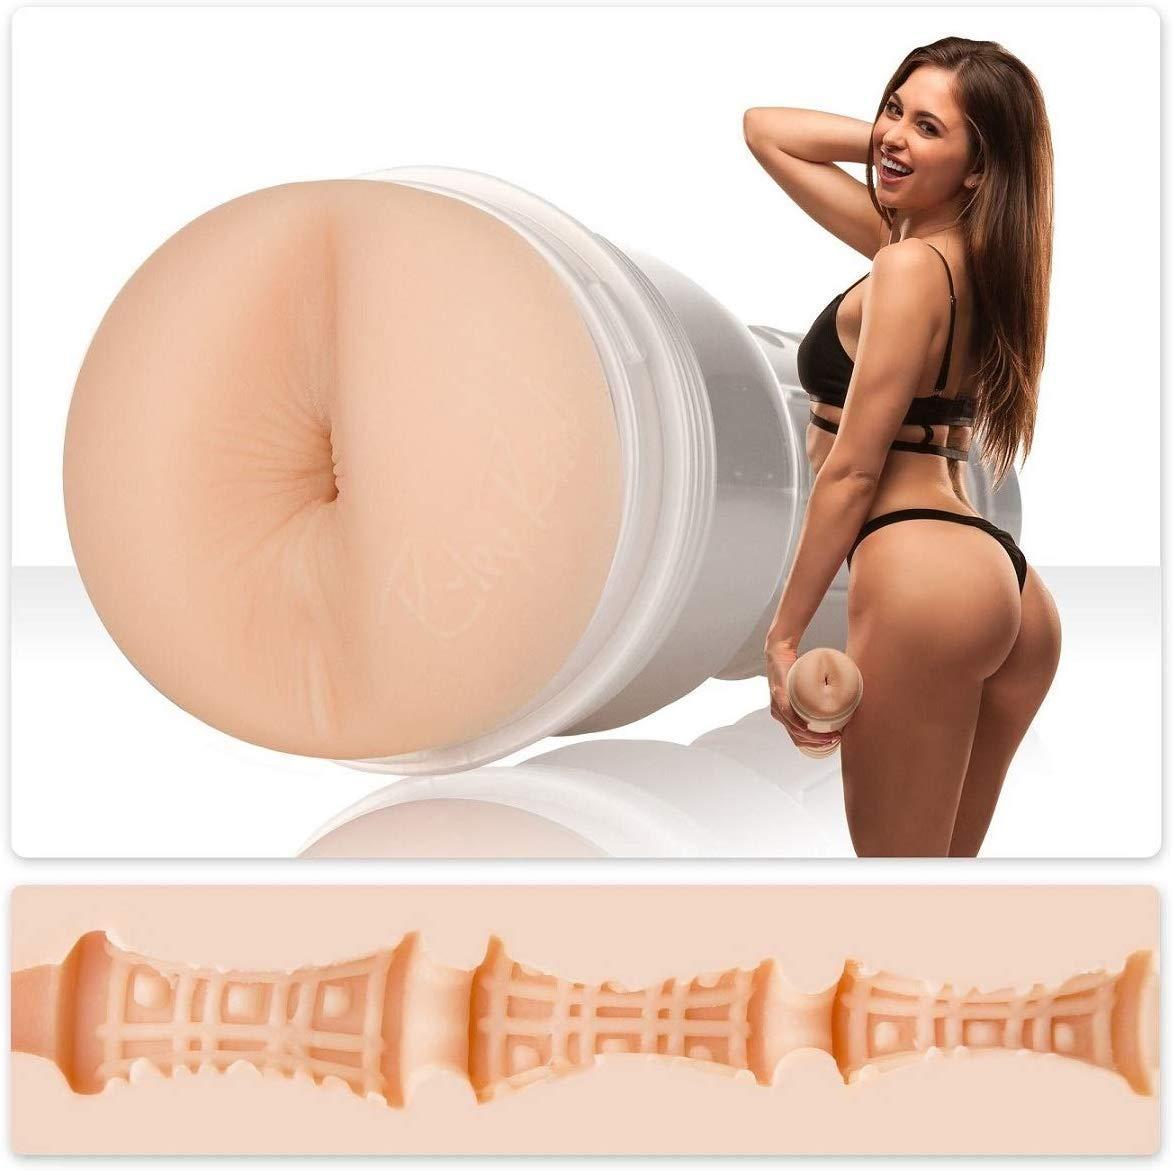 Fleshlight Girls | Riley Reid | Doggy Style | Euphoria | Realistic Anal Sex Toy by Fleshlight Girls